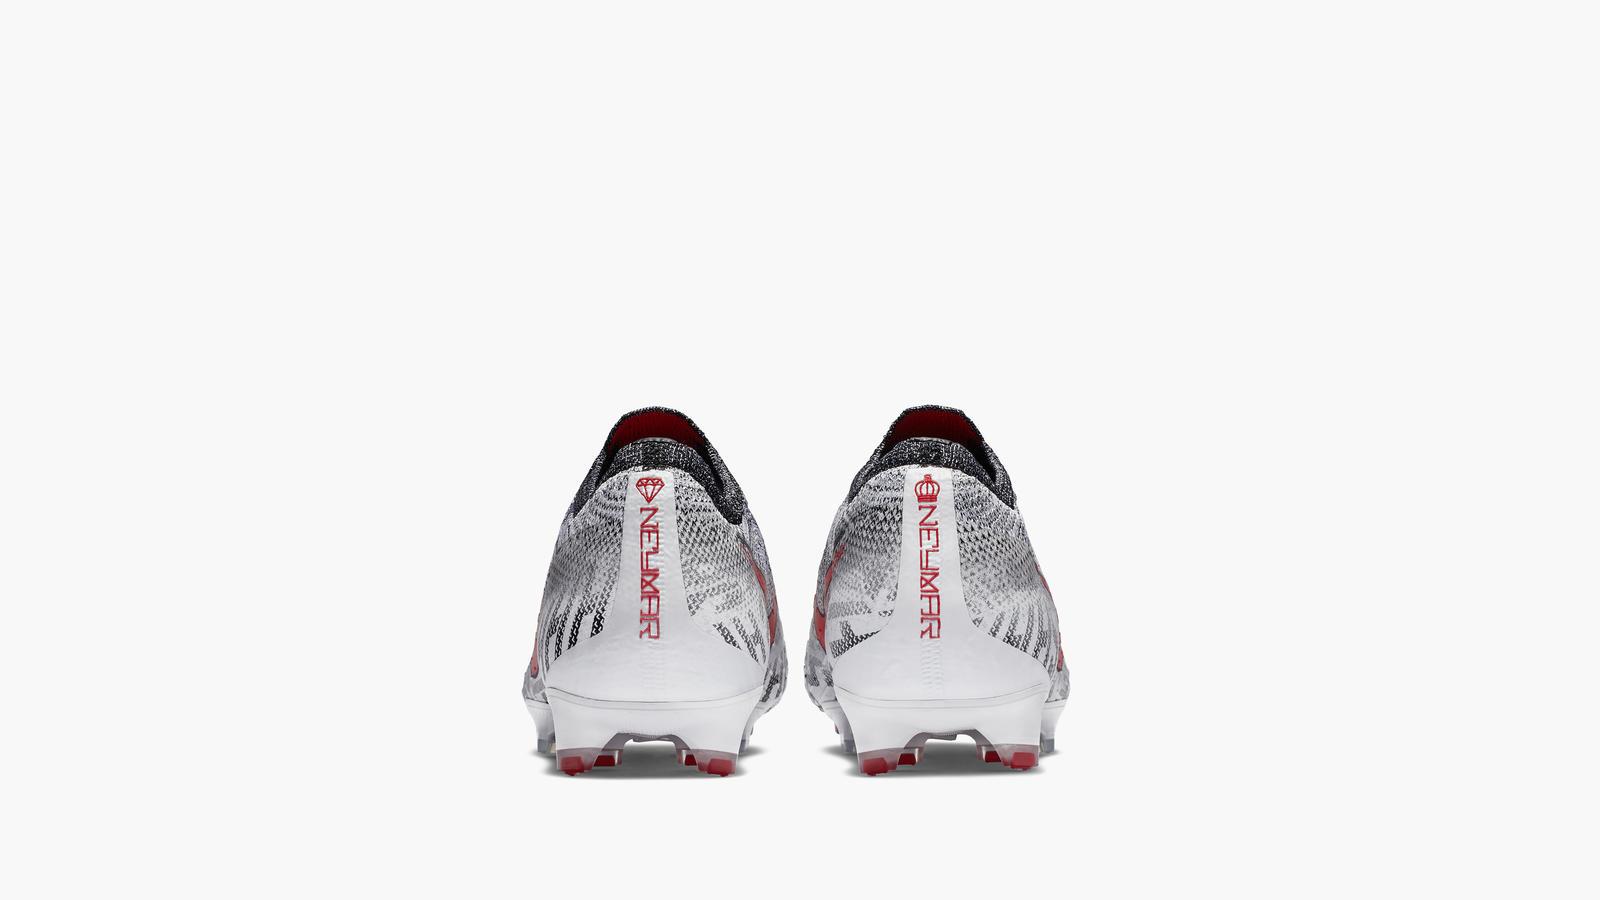 Nike Mercurial Vapor 360 NJR Silêncio 5